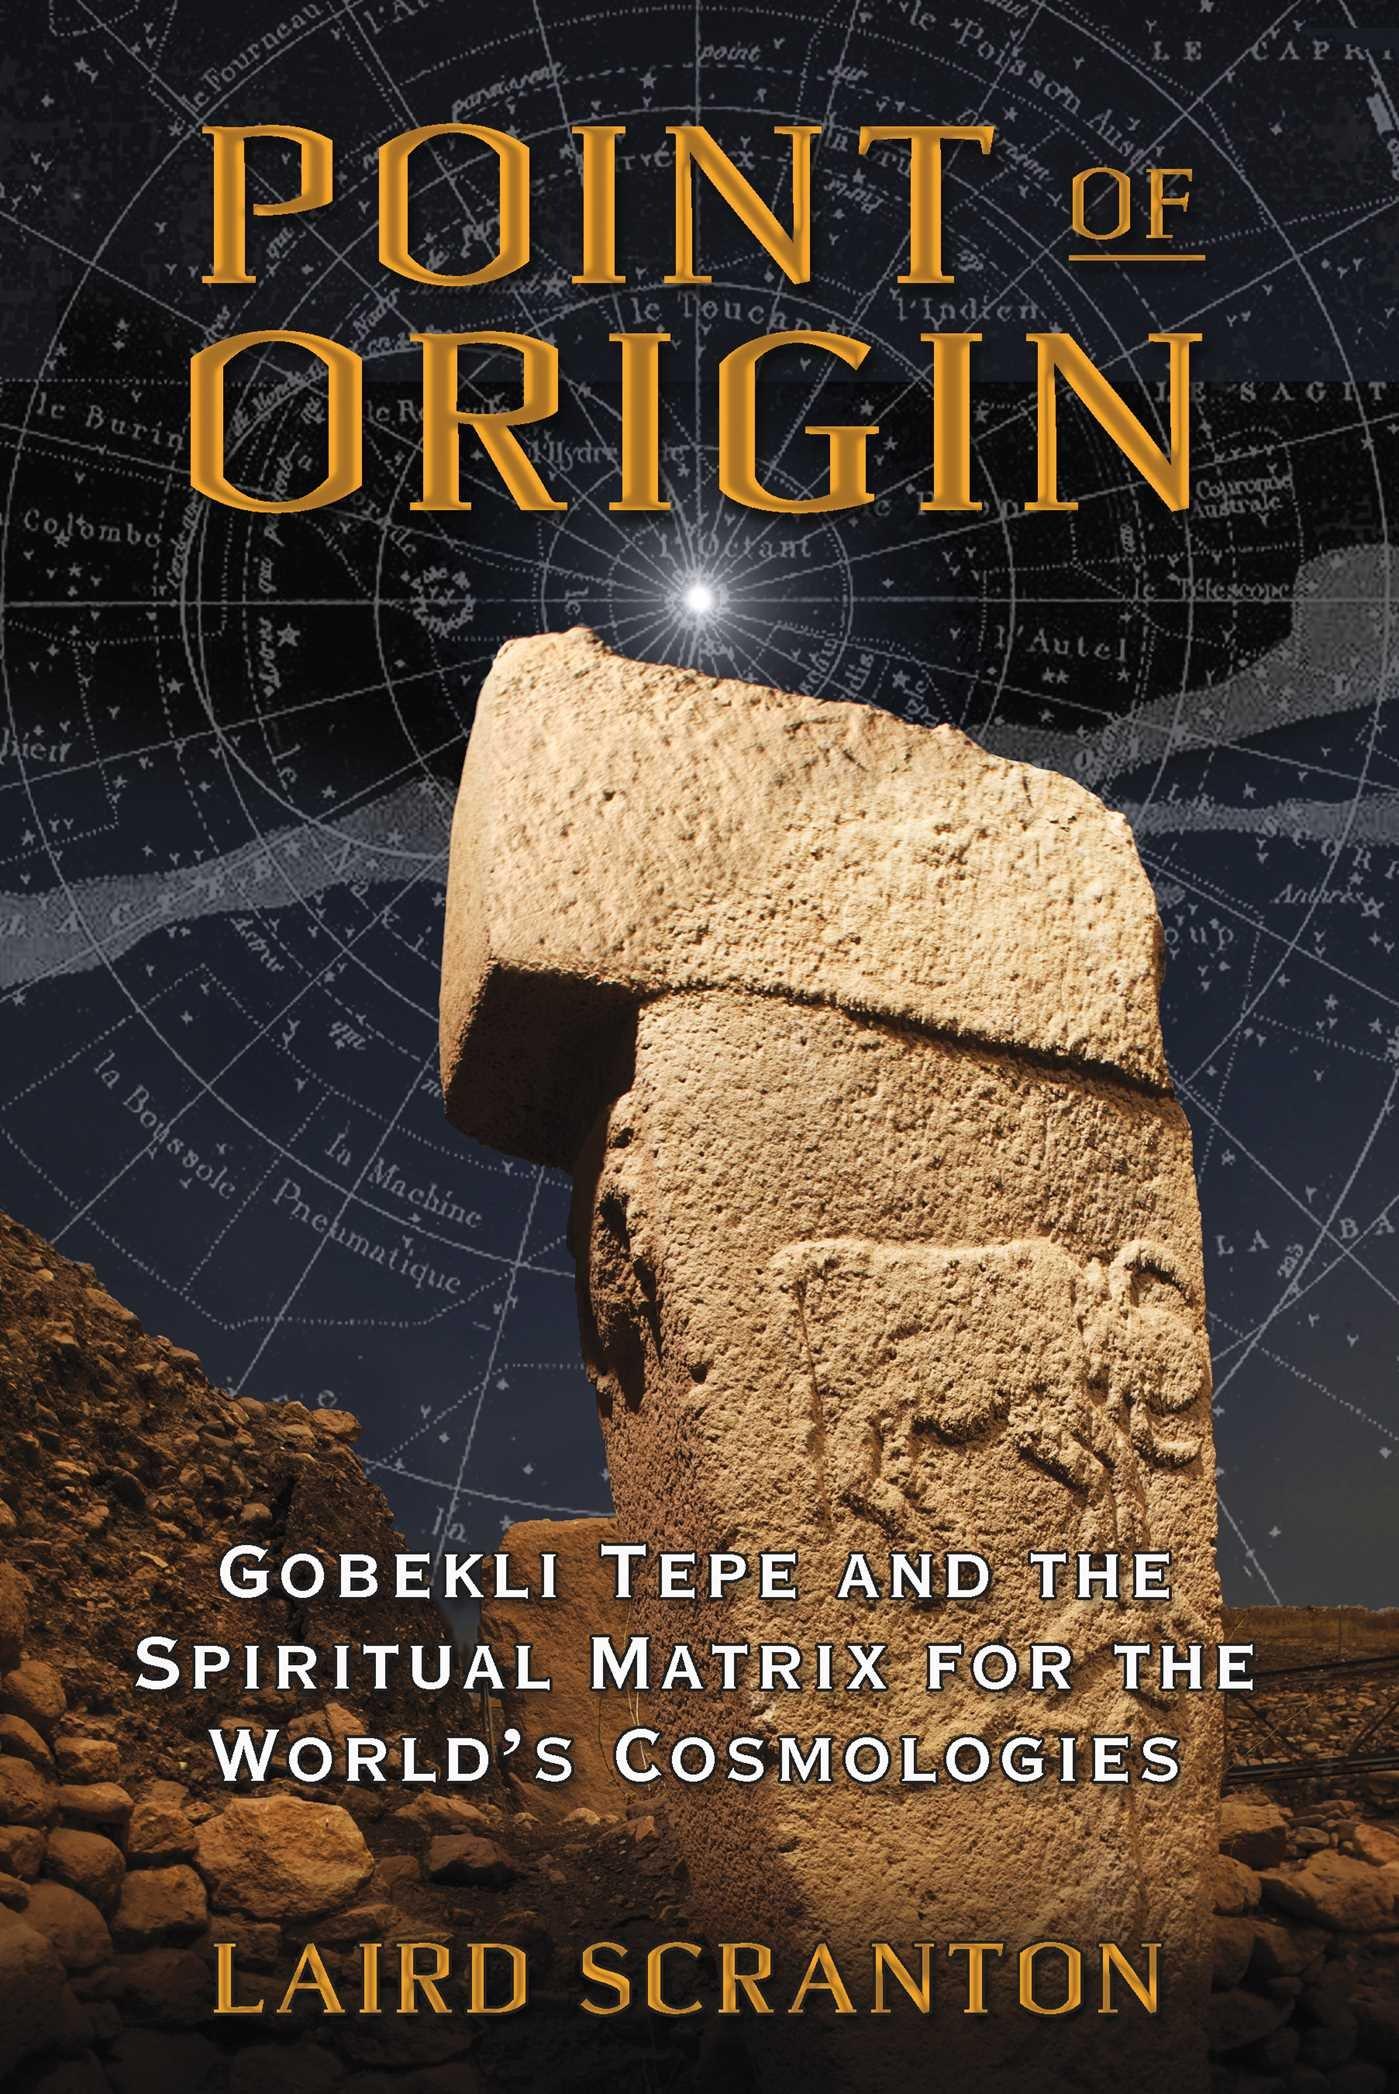 Point of origin gobekli tepe and the spiritual matrix for the point of origin gobekli tepe and the spiritual matrix for the worlds cosmologies laird scranton 9781620554449 amazon books biocorpaavc